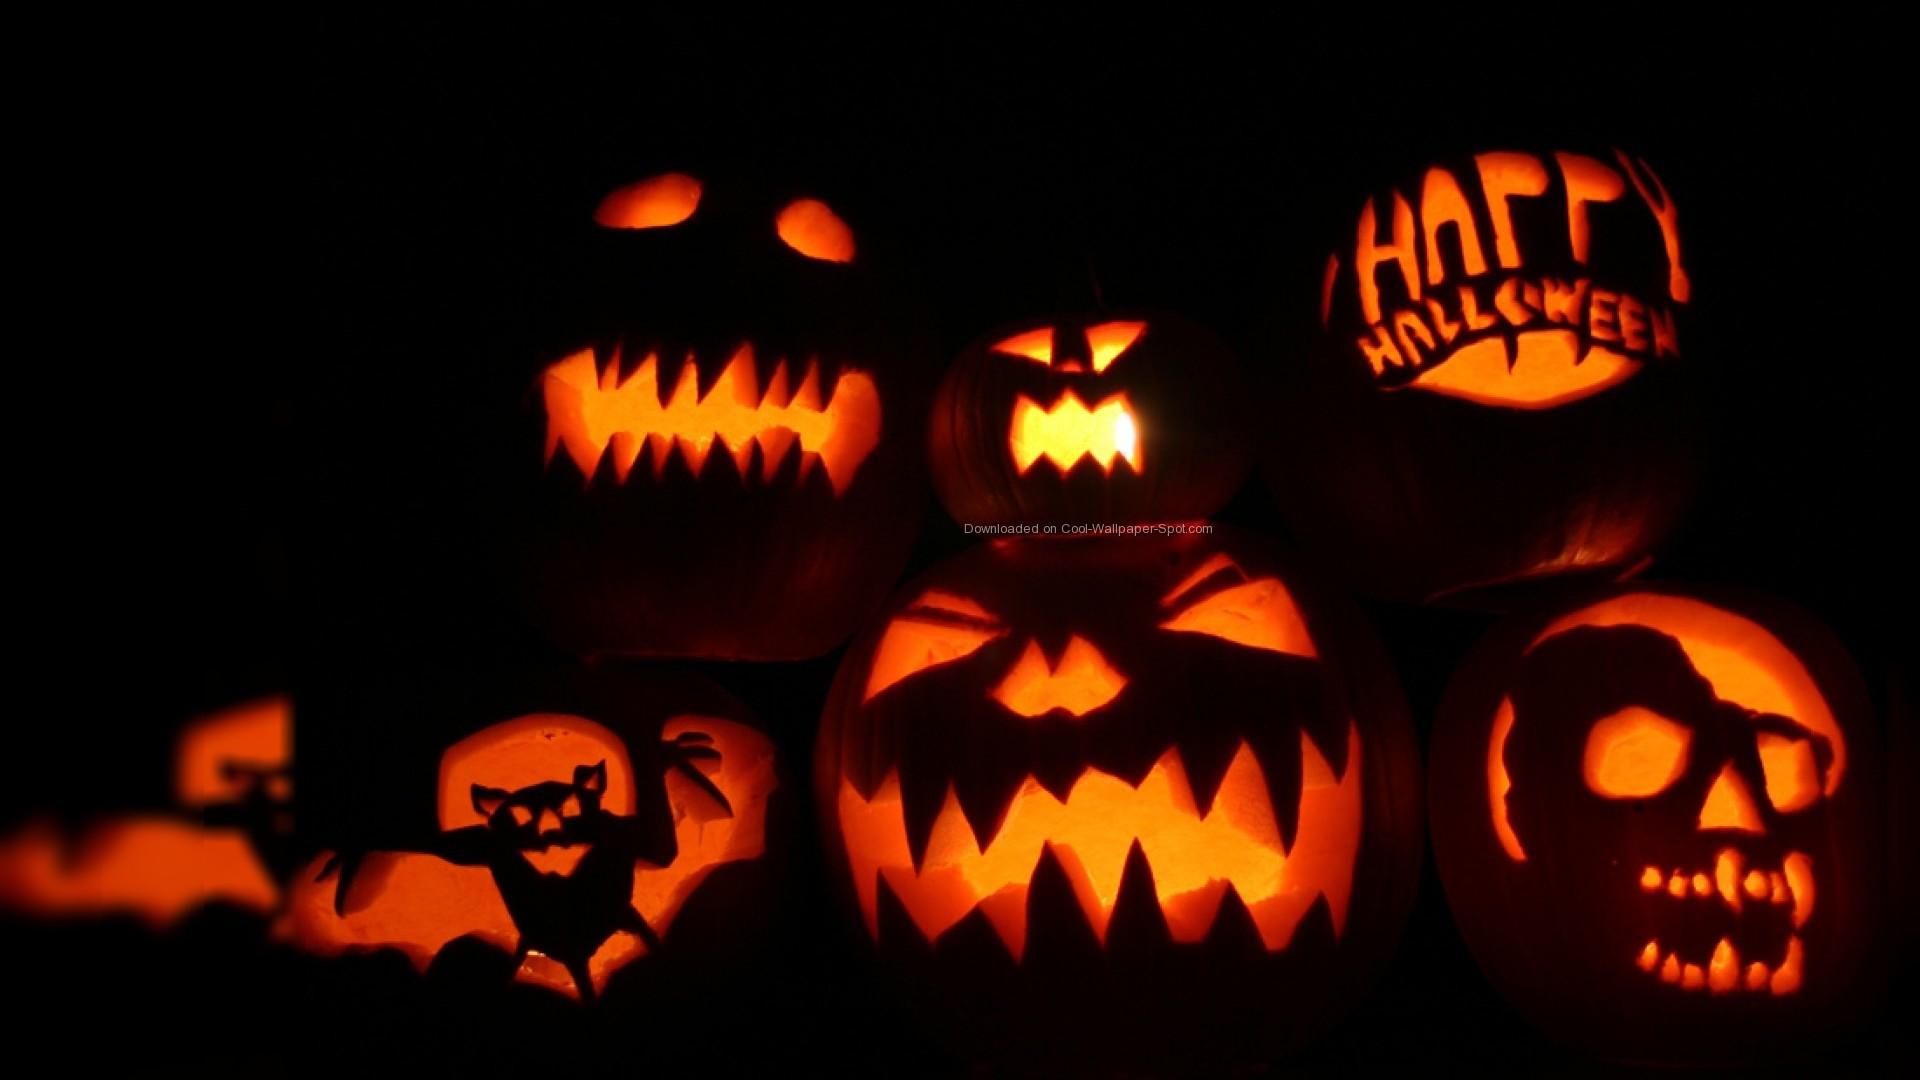 Desktop Backgrounds Halloween – Festival Collections